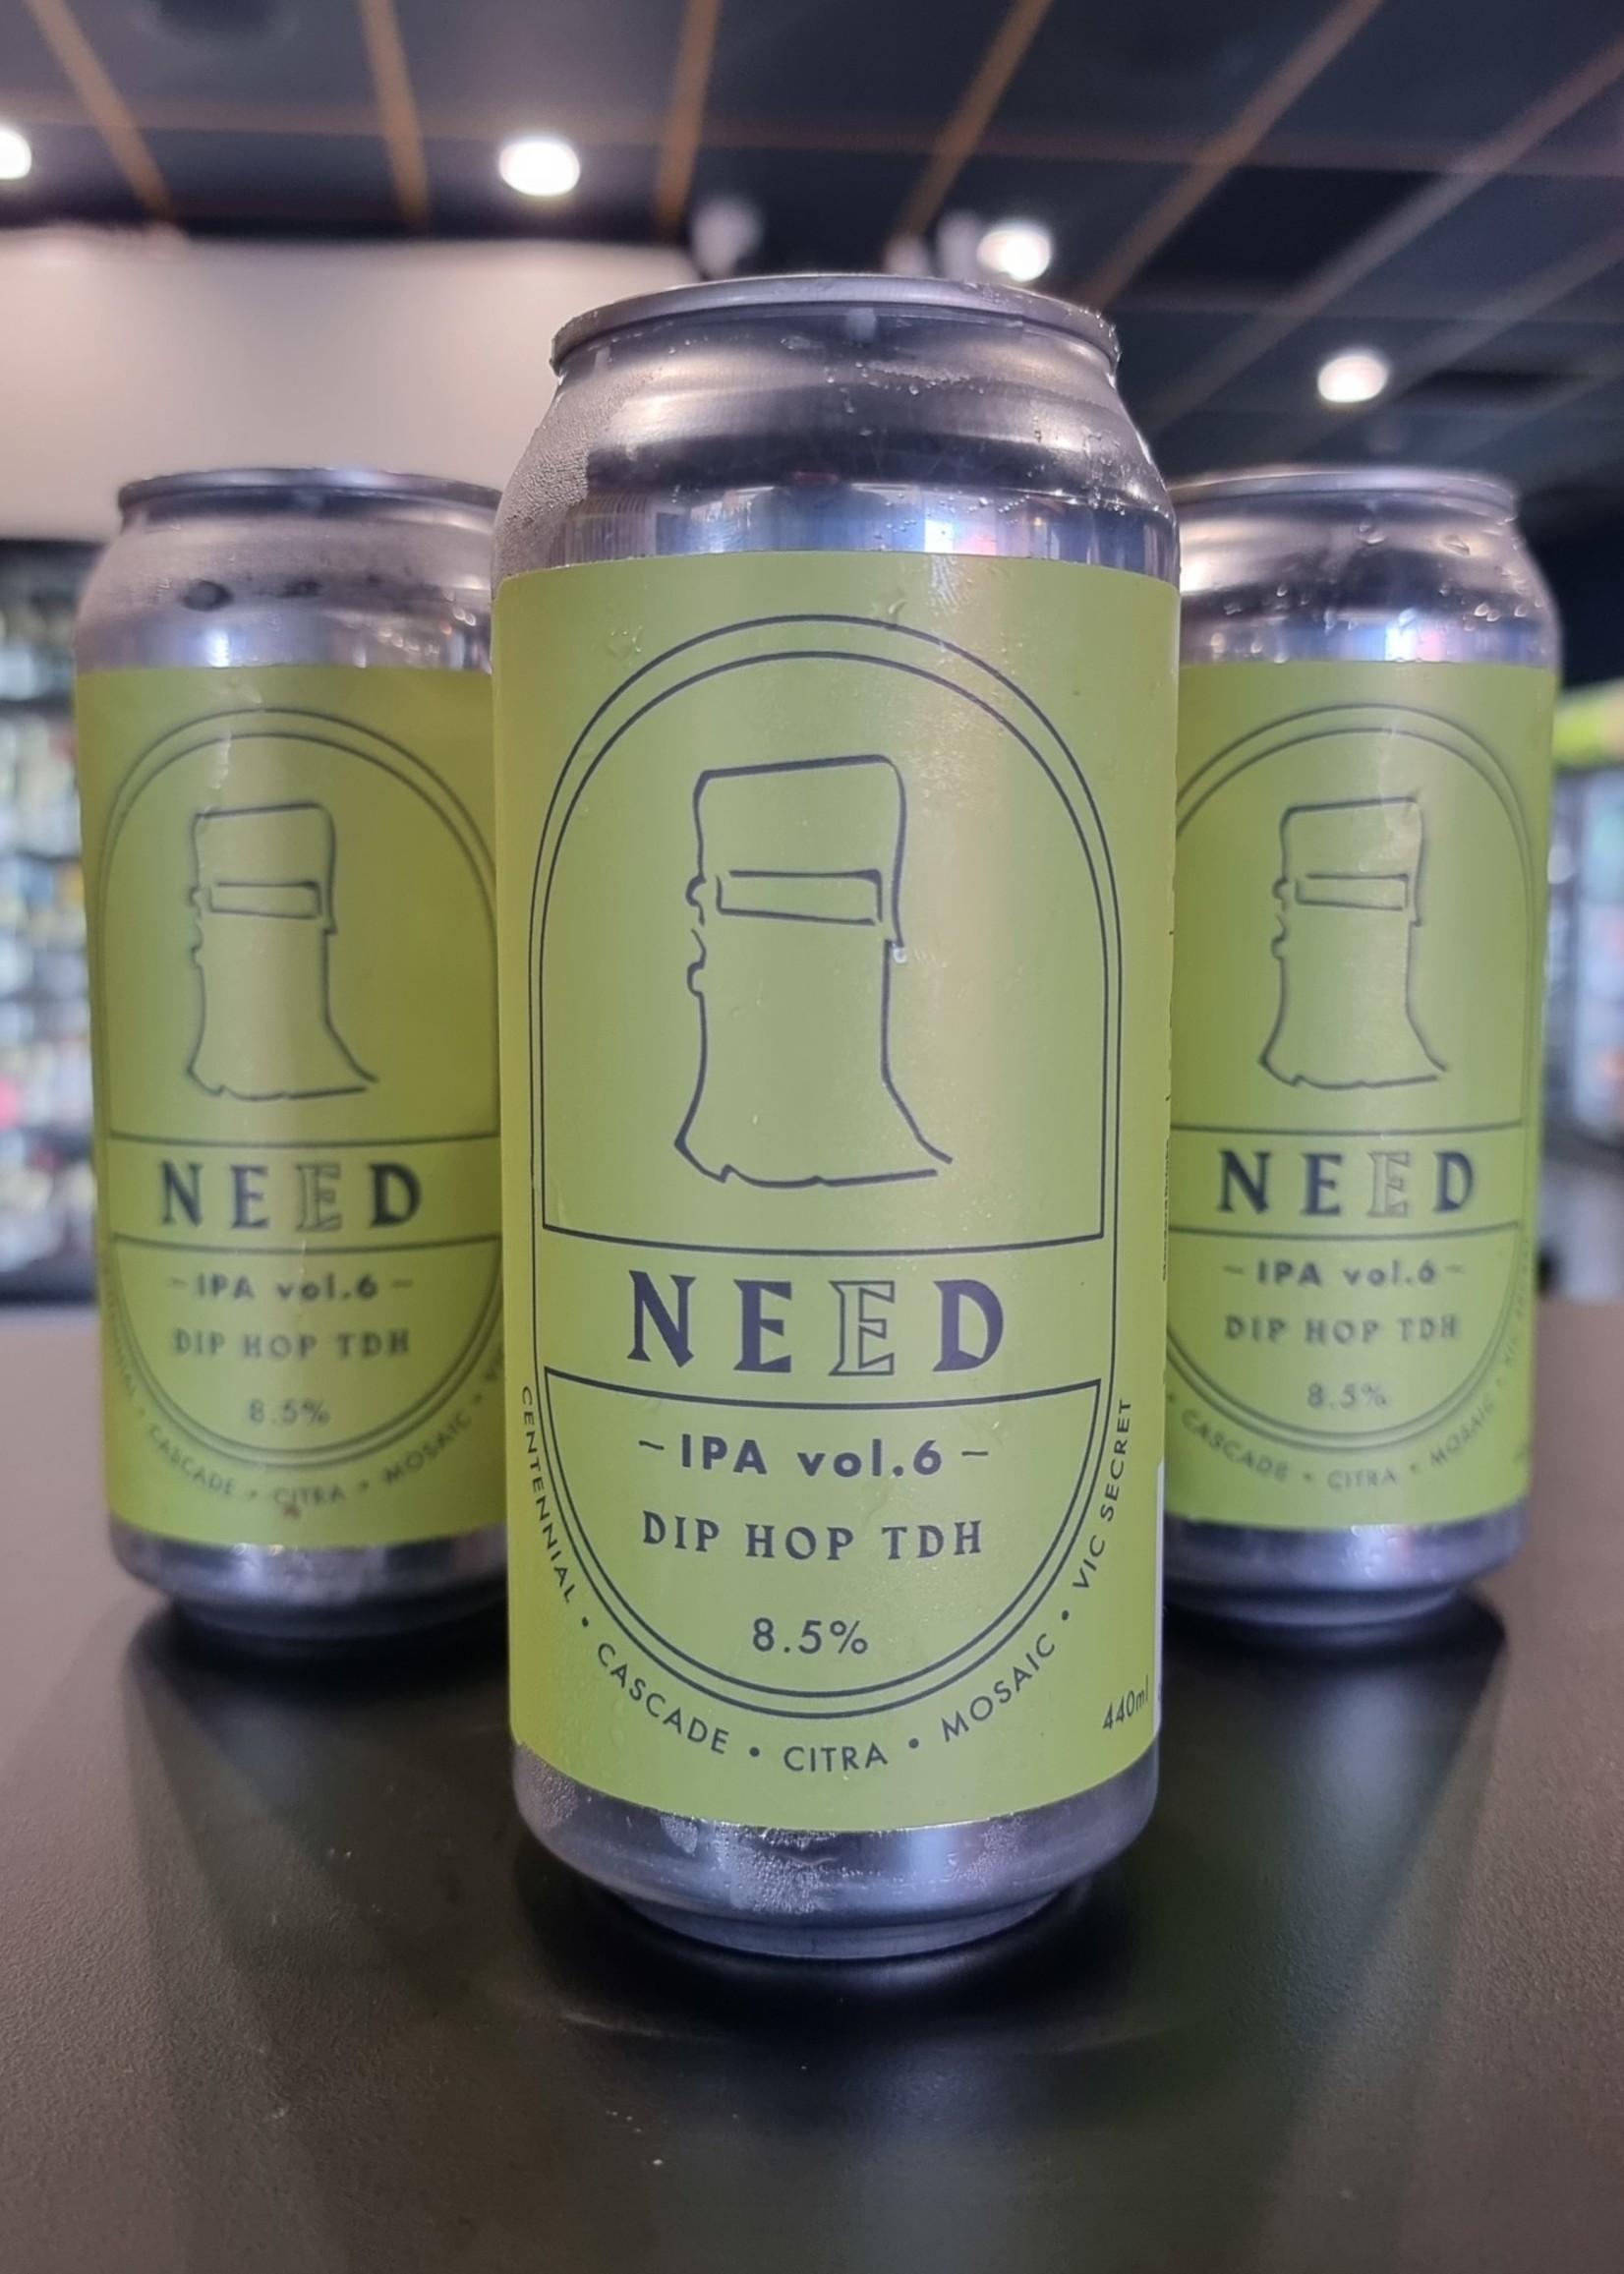 Bridge Road Brewers NEED IPA Vol.6 single